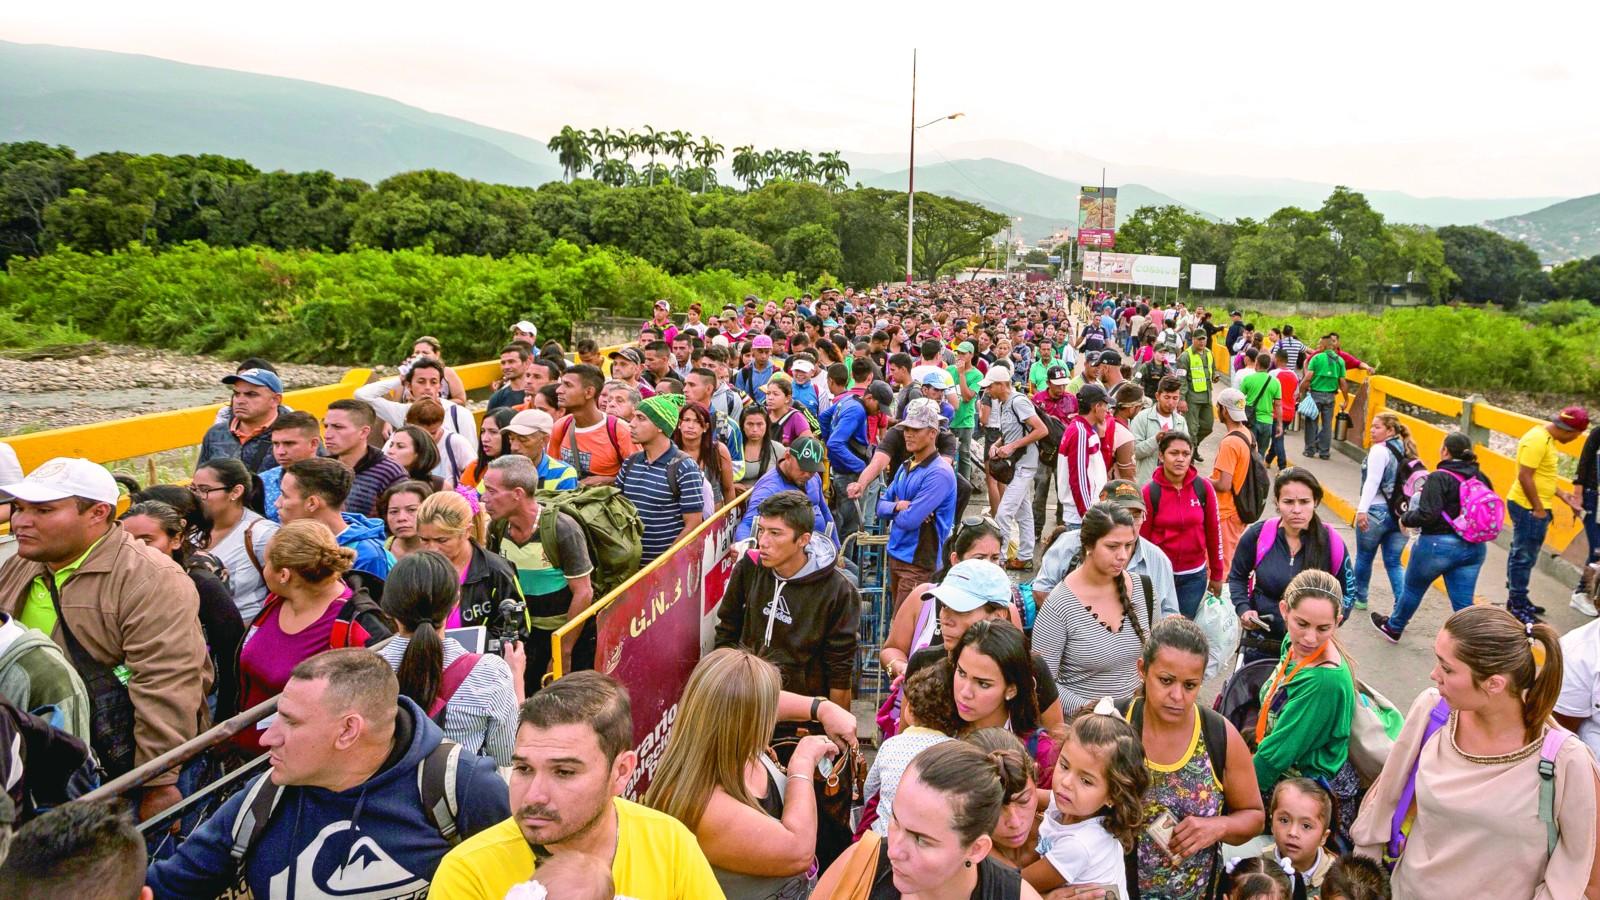 República Dominicana exigirá visa a venezolanos a partir del 16 de diciembre